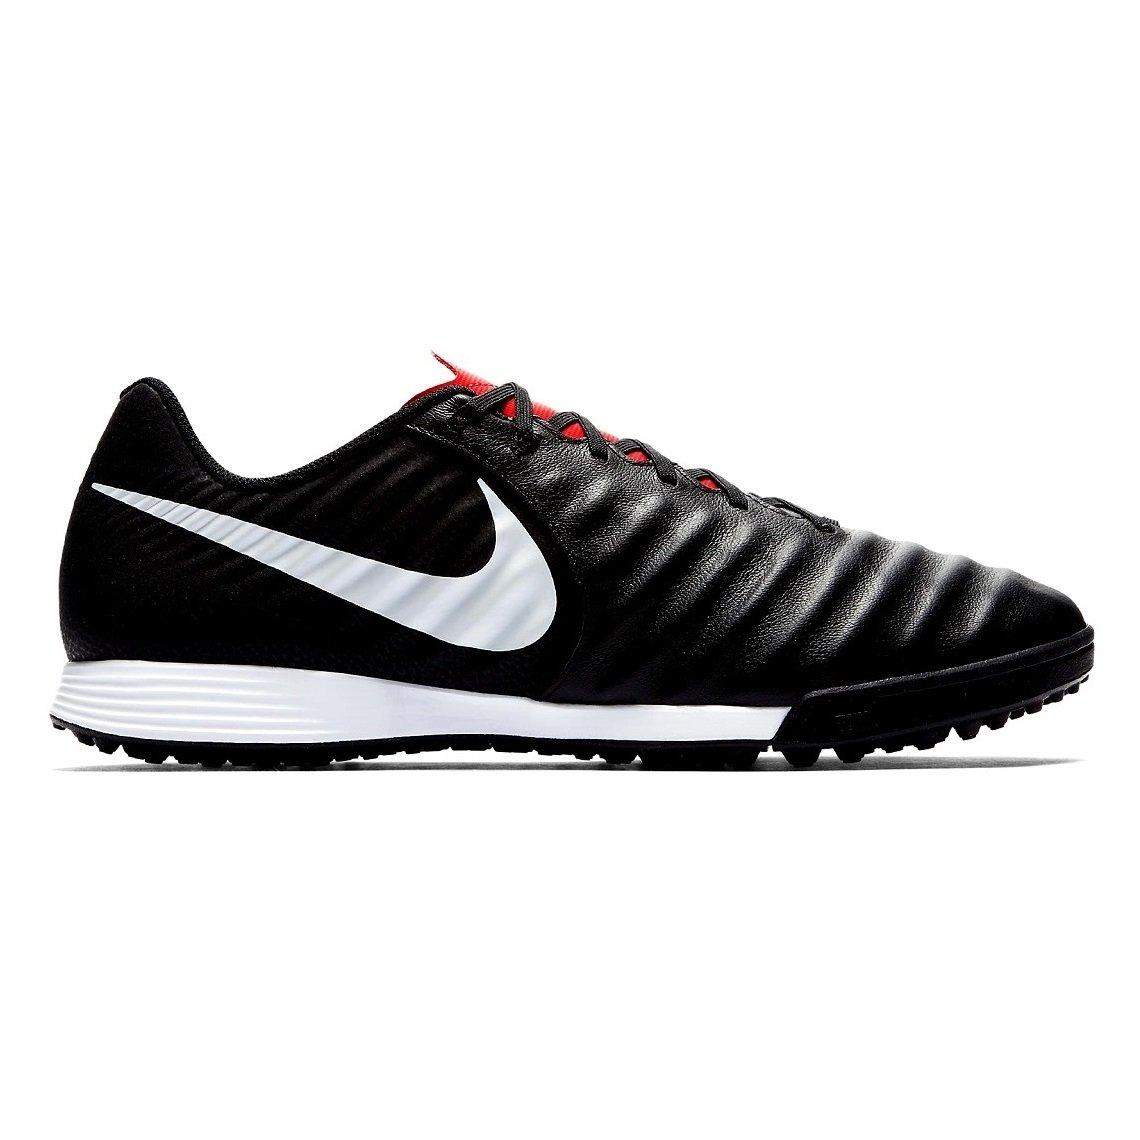 730d1494f Passe o mouse na imagem para ampliar Ampliar imagem. Chuteira Society Nike  ...